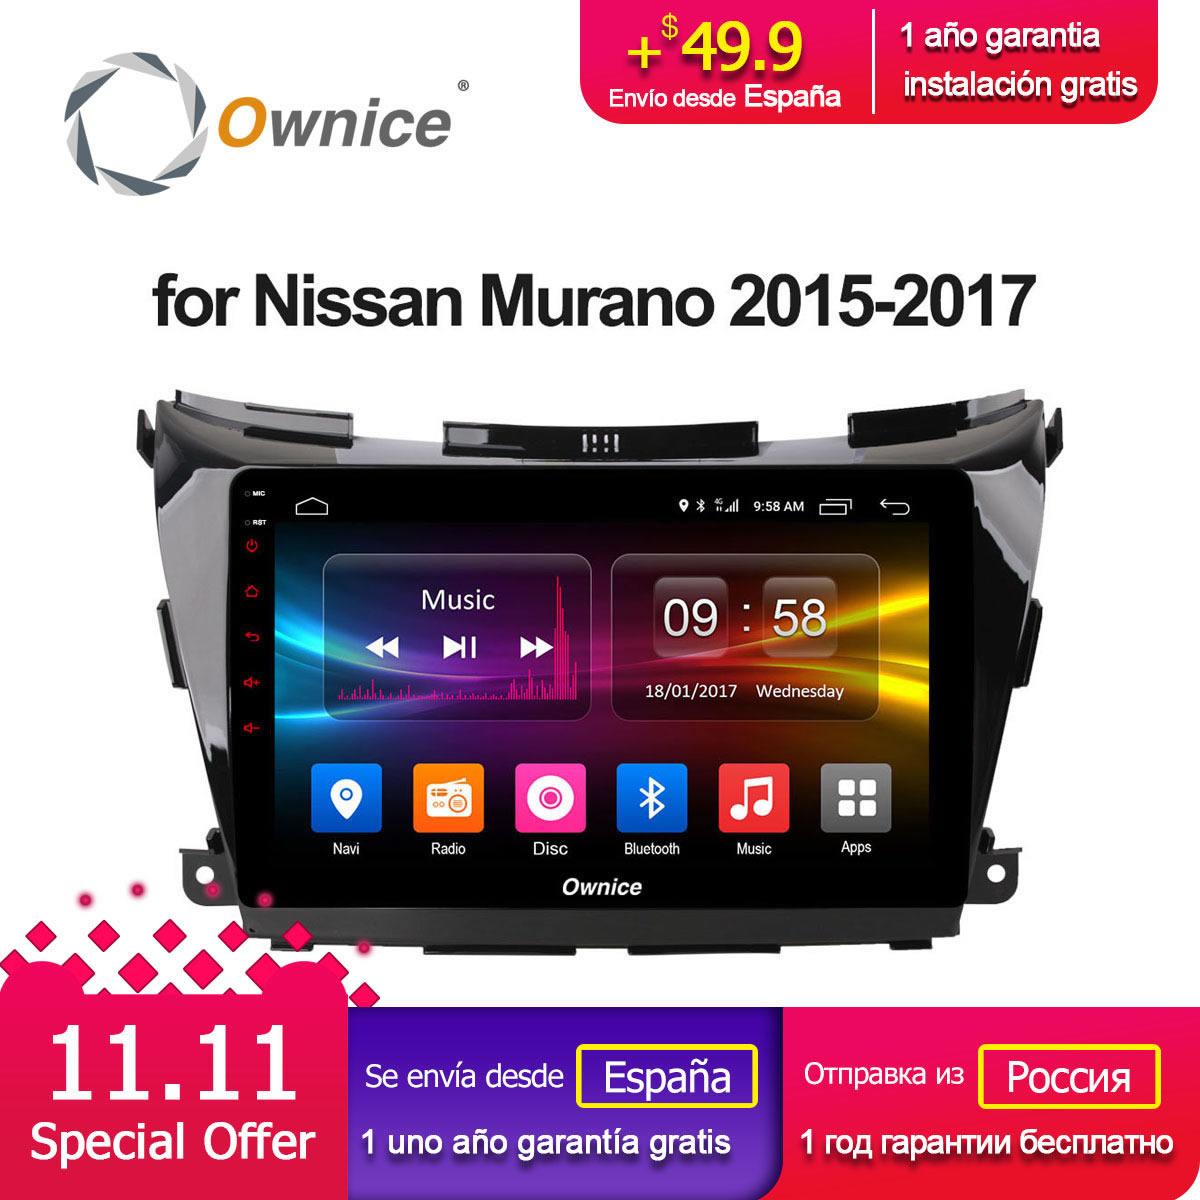 Ownice C500+ G10 10.1 Octa core Android 8.1 GPS NAVI DVD Radio Player For Nissan Murano 2015 ~ 2017 Support 4G SIM DAB+ 32G ROM ownice c500 4g sim lte octa 8 core android 6 0 for kia ceed 2013 2015 car dvd player gps navi radio wifi 4g bt 2gb ram 32g rom